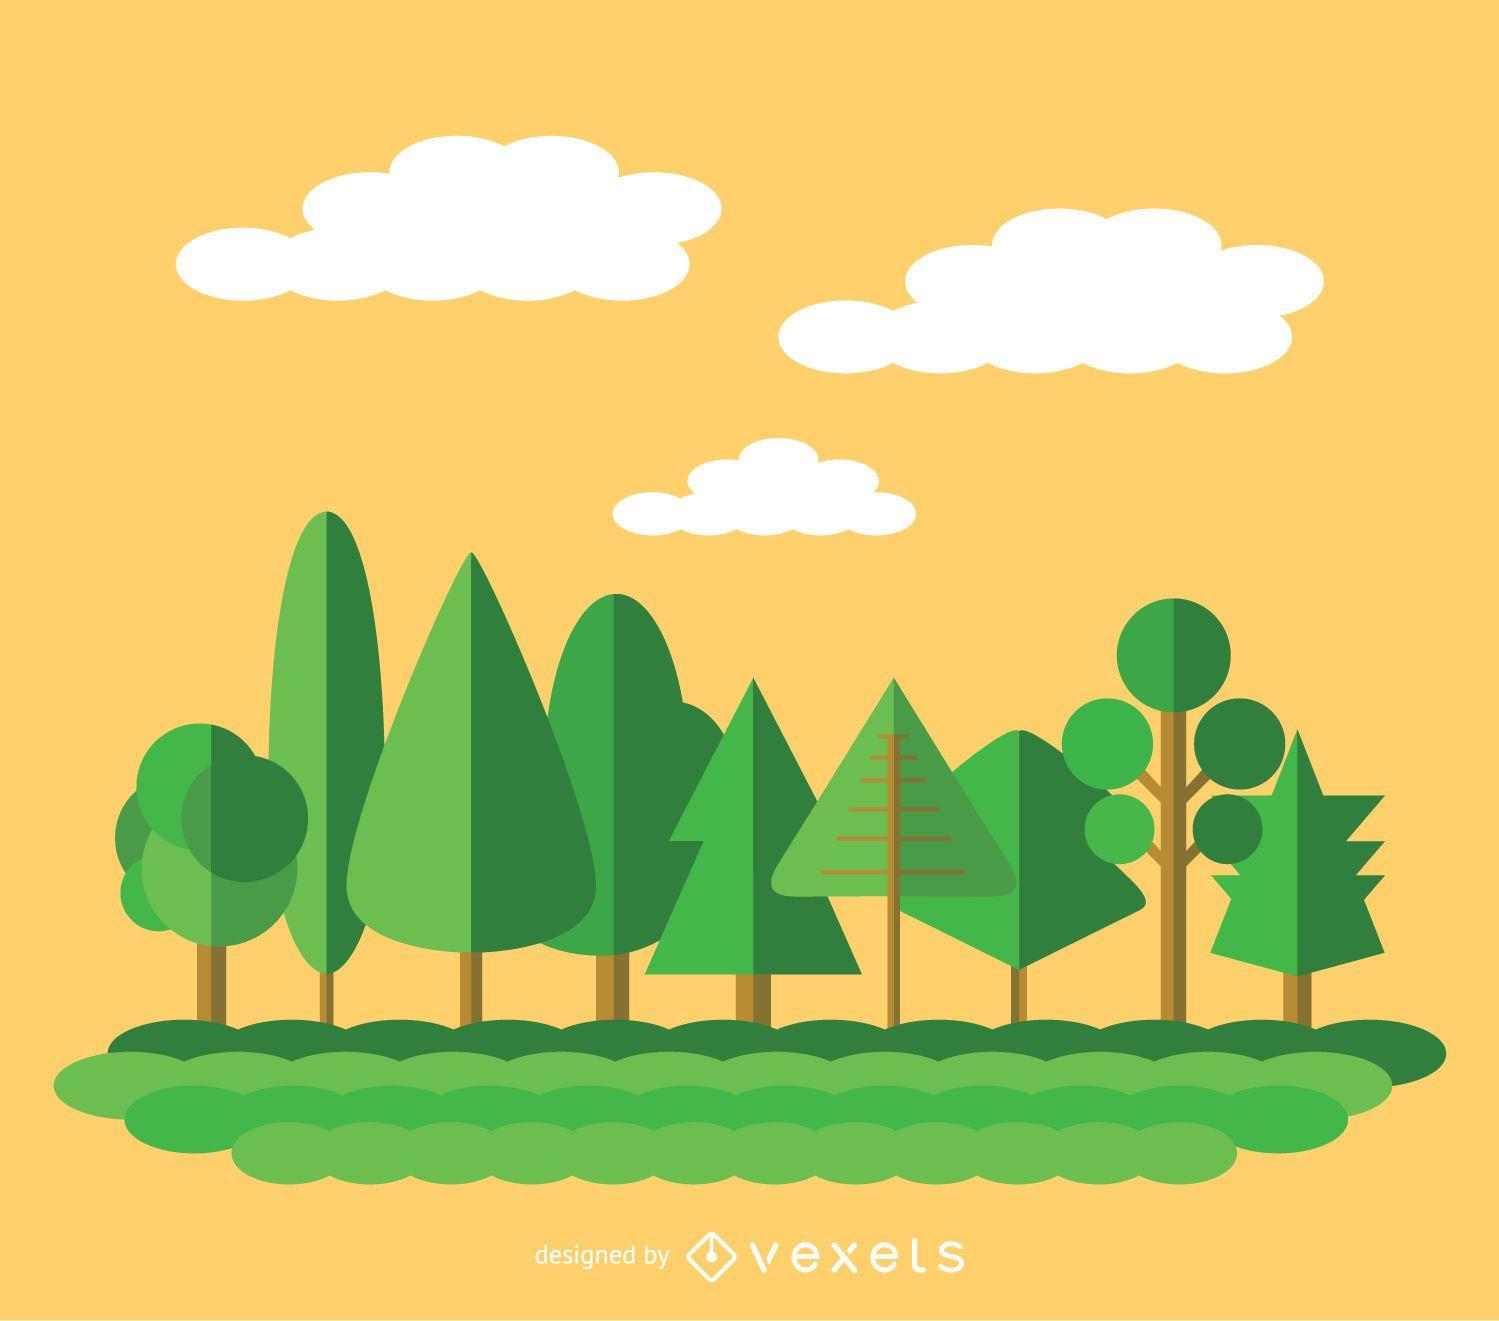 9 árboles verdes planos